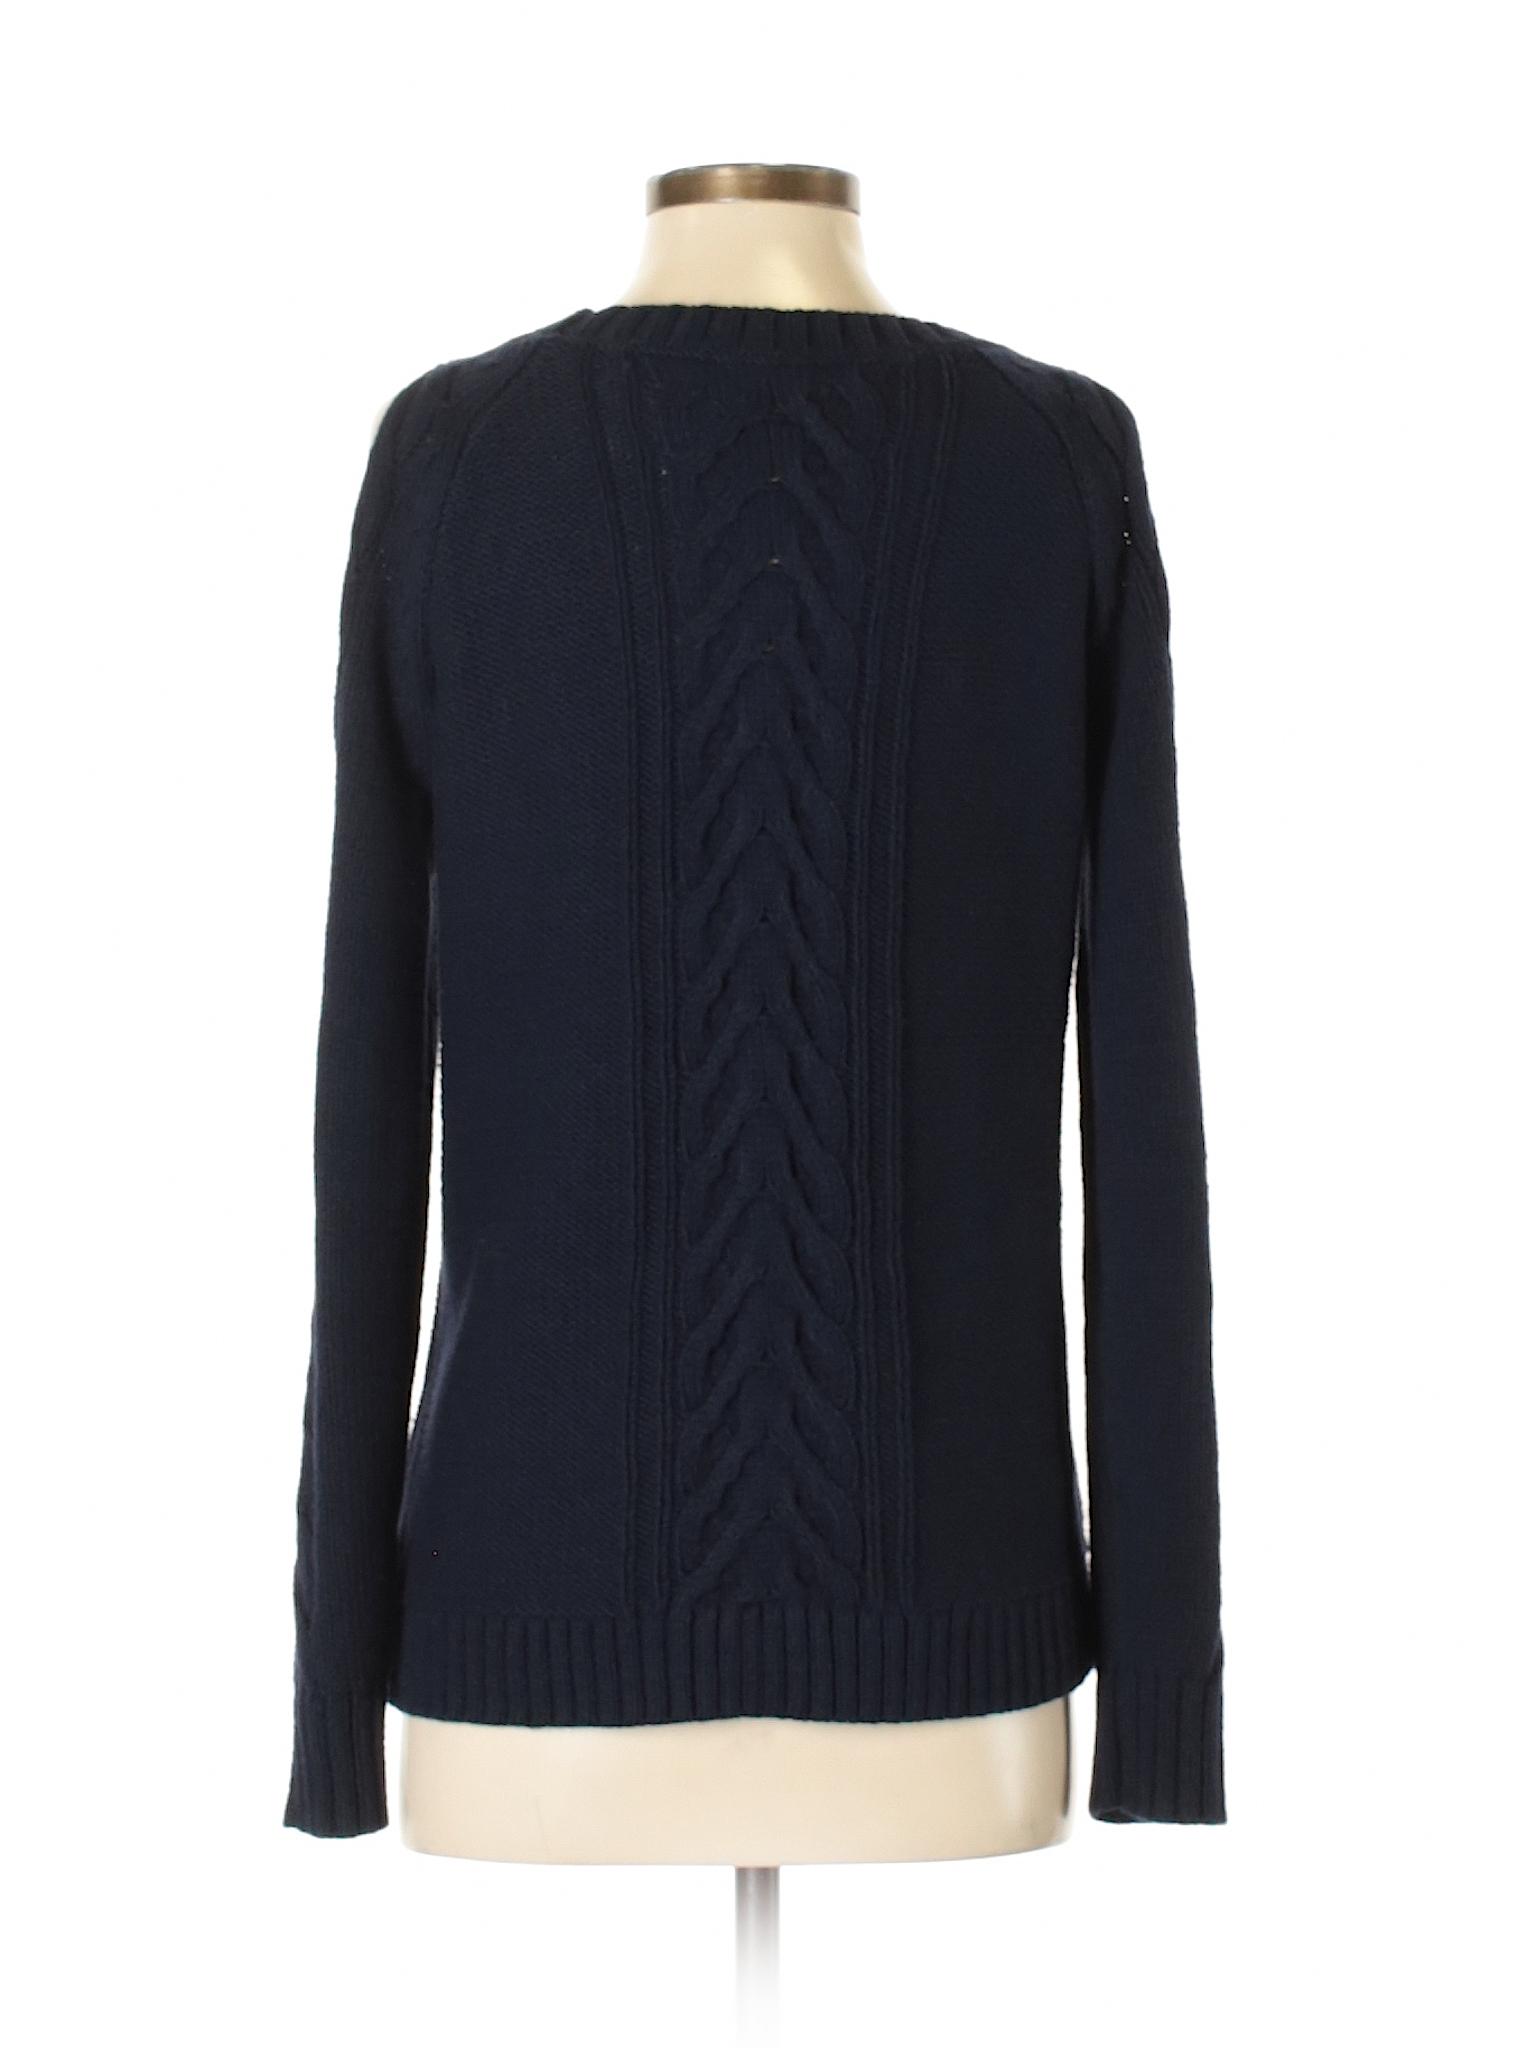 LOFT Sweater Ann Pullover Taylor Boutique xPqC8w4Ow